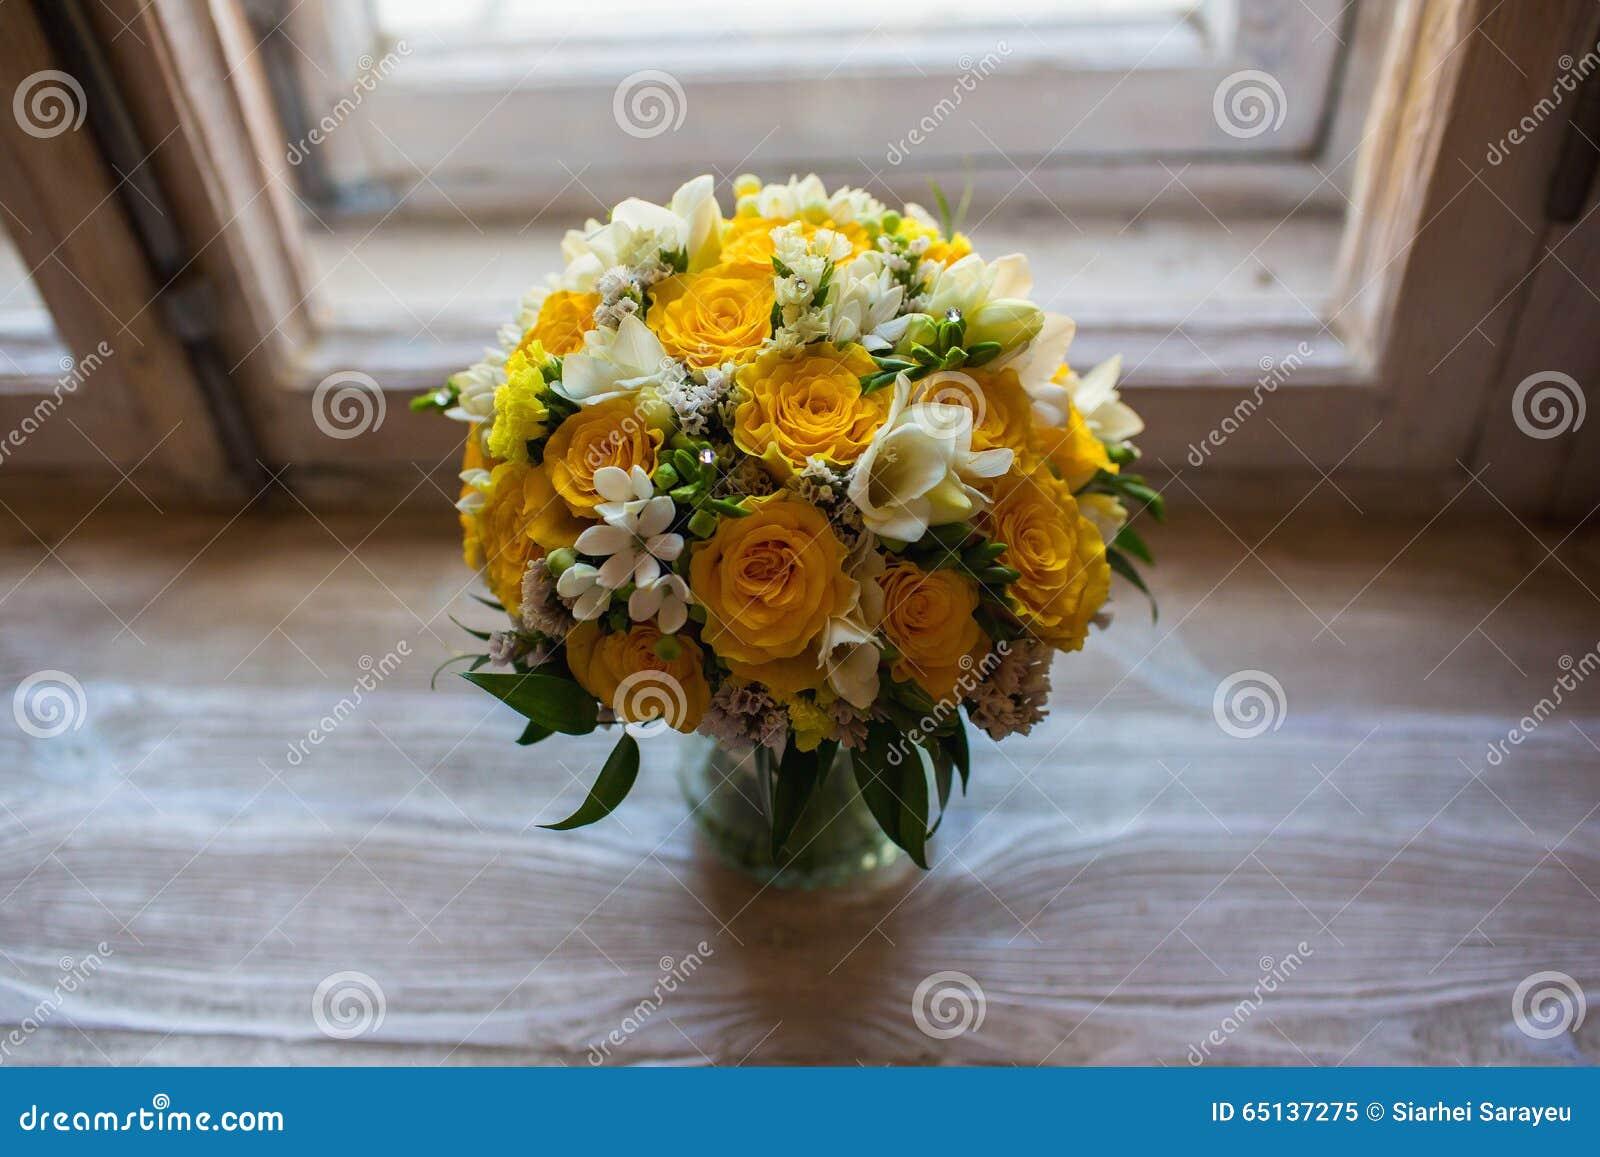 Beautiful wedding bouquet on windowsill background